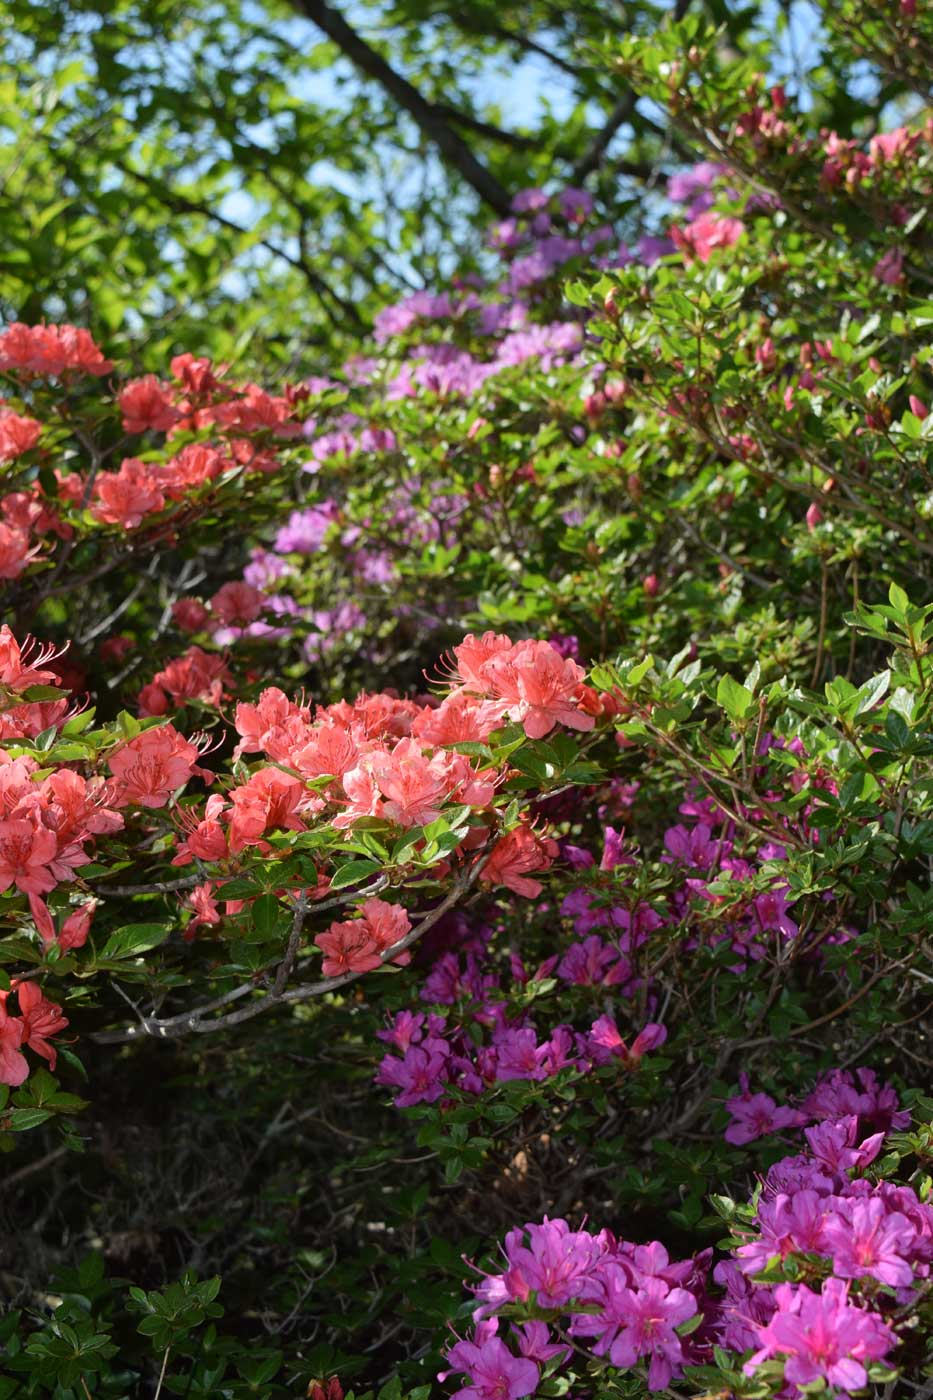 The bewildering population of <i>Rhododendron</i> x <i>obtusum</i>, showing impressive degree of variation.